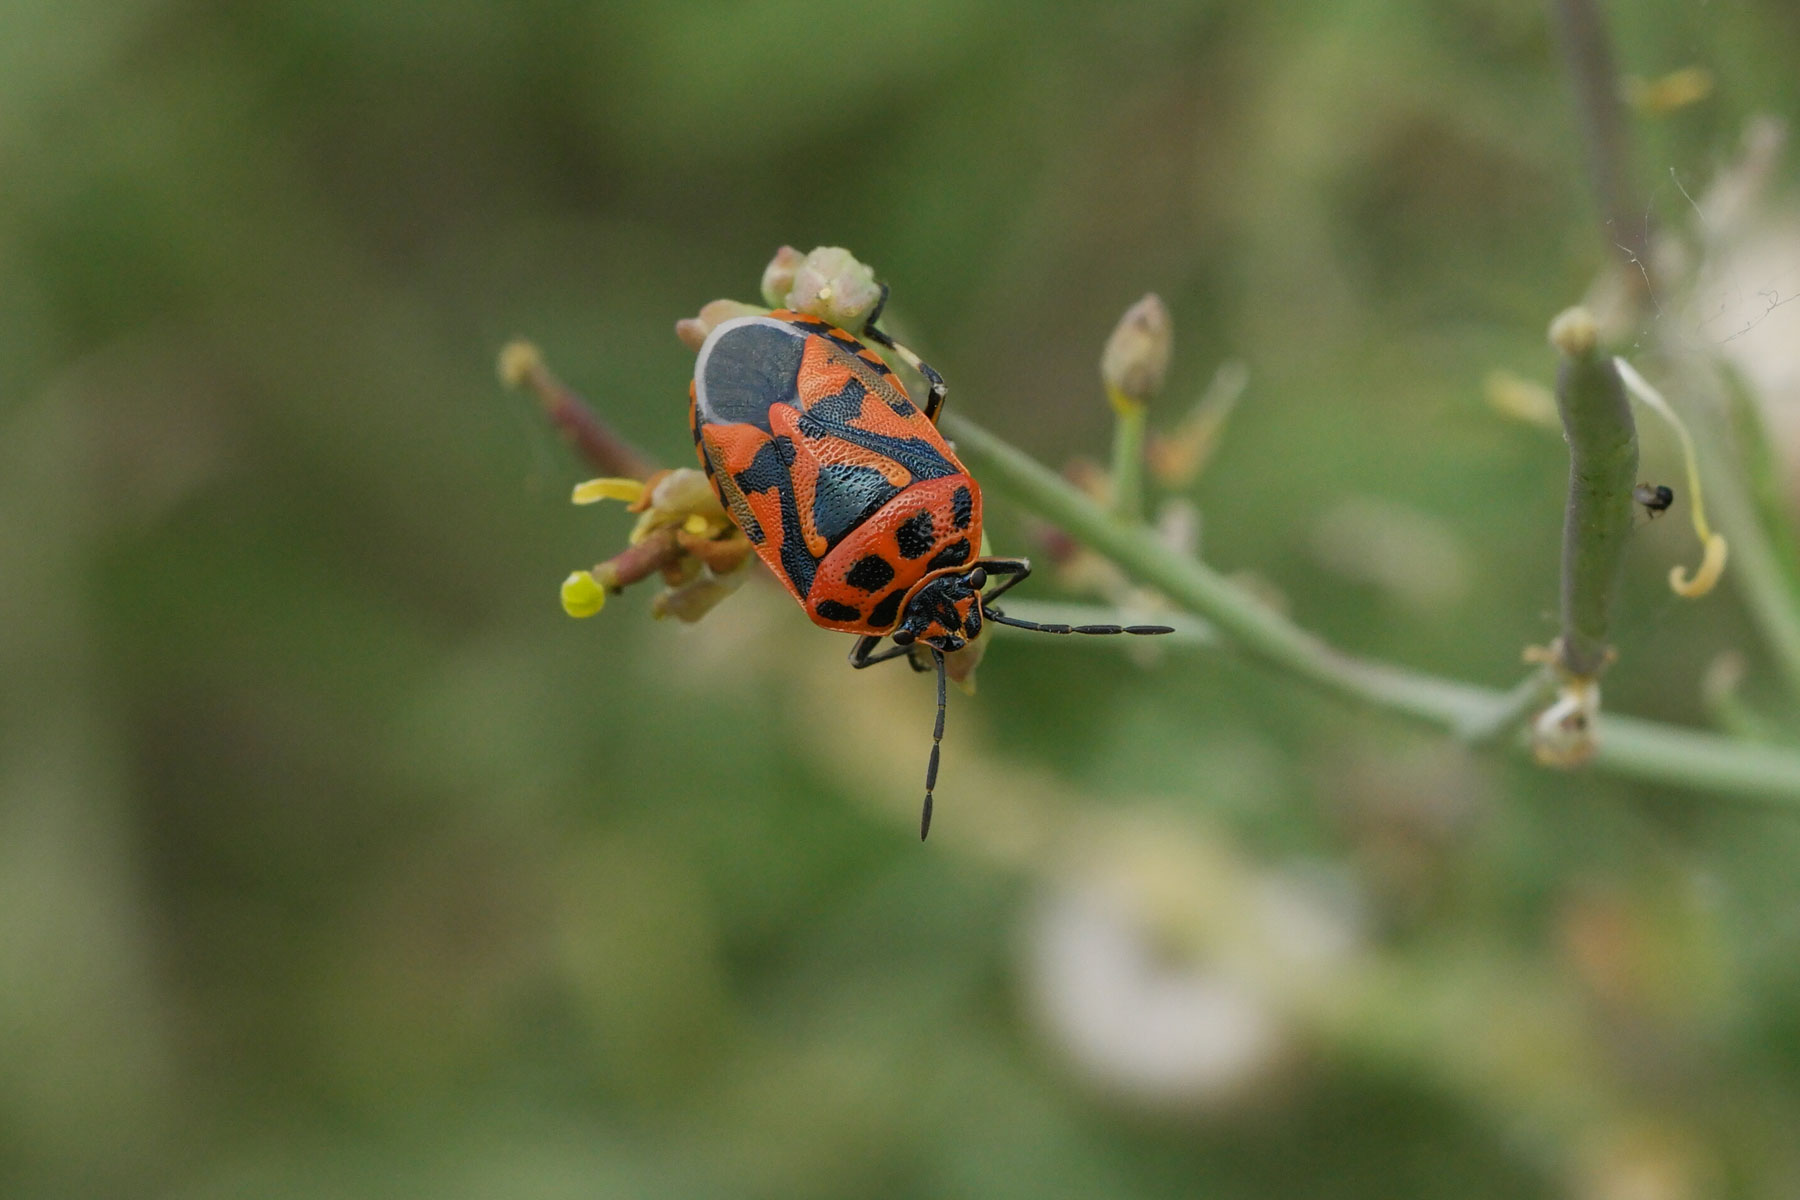 Eurydema ornata